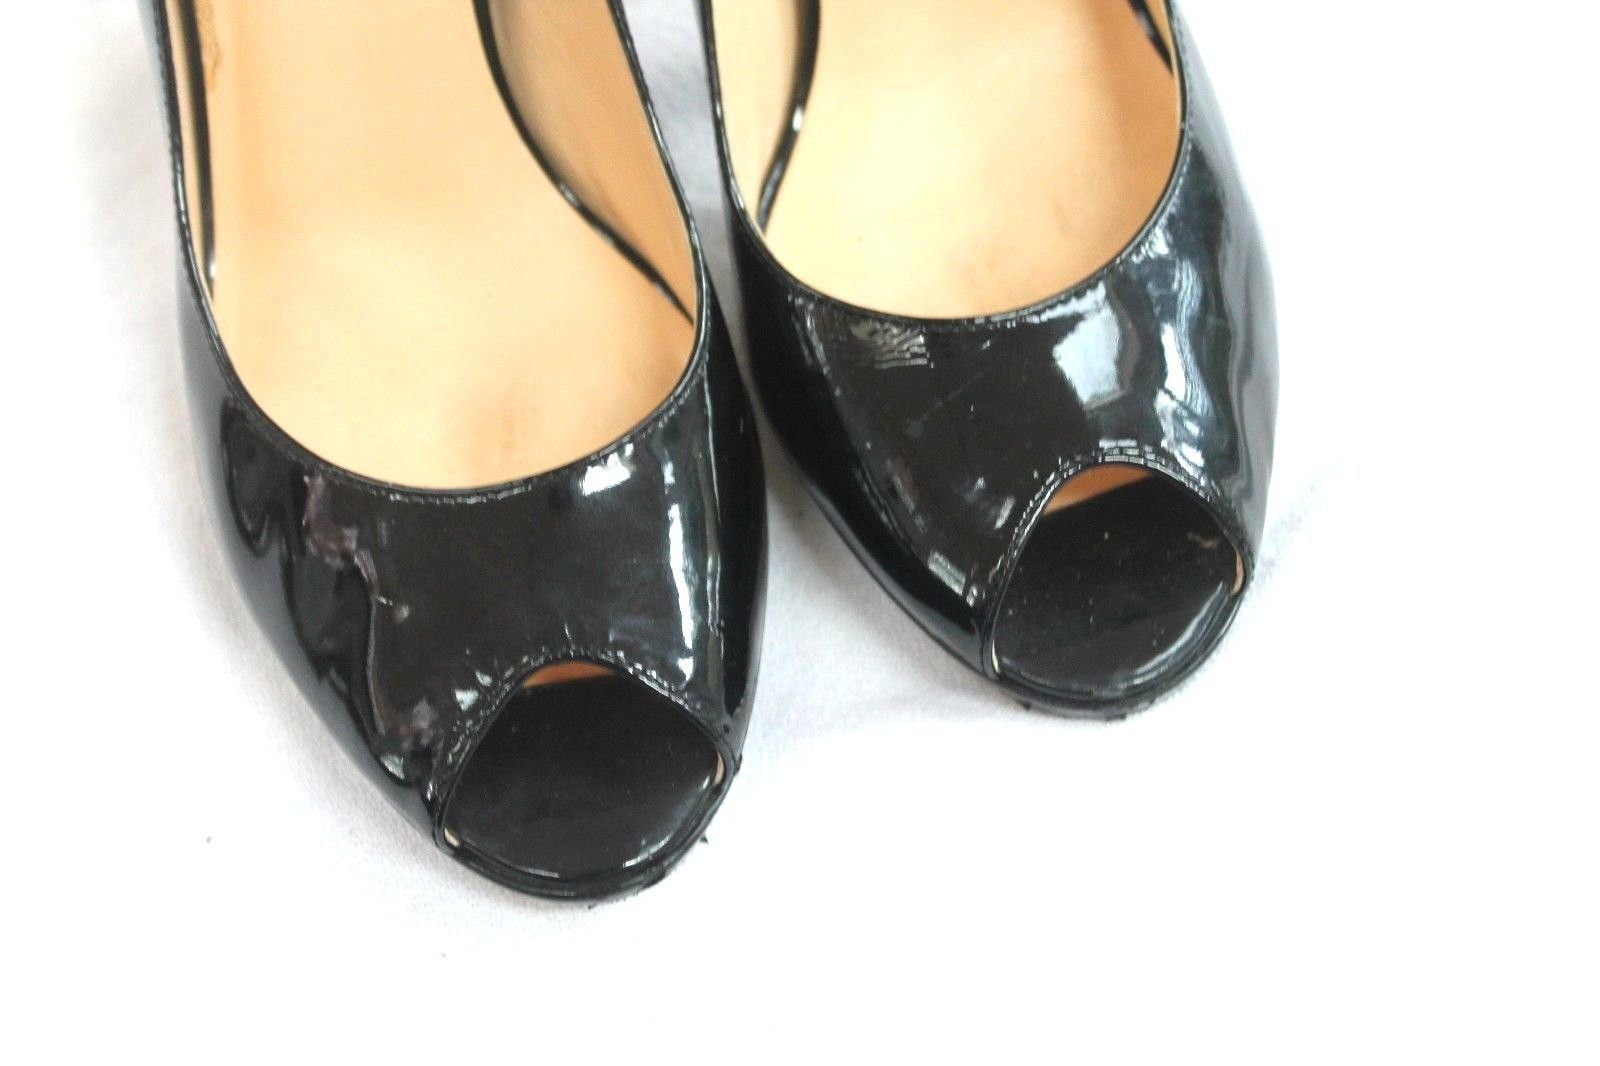 ffae8d6daf7 COLE HAAN Black Patent Leather Peep Toe Platform Pump Dress Heels 7.5 B